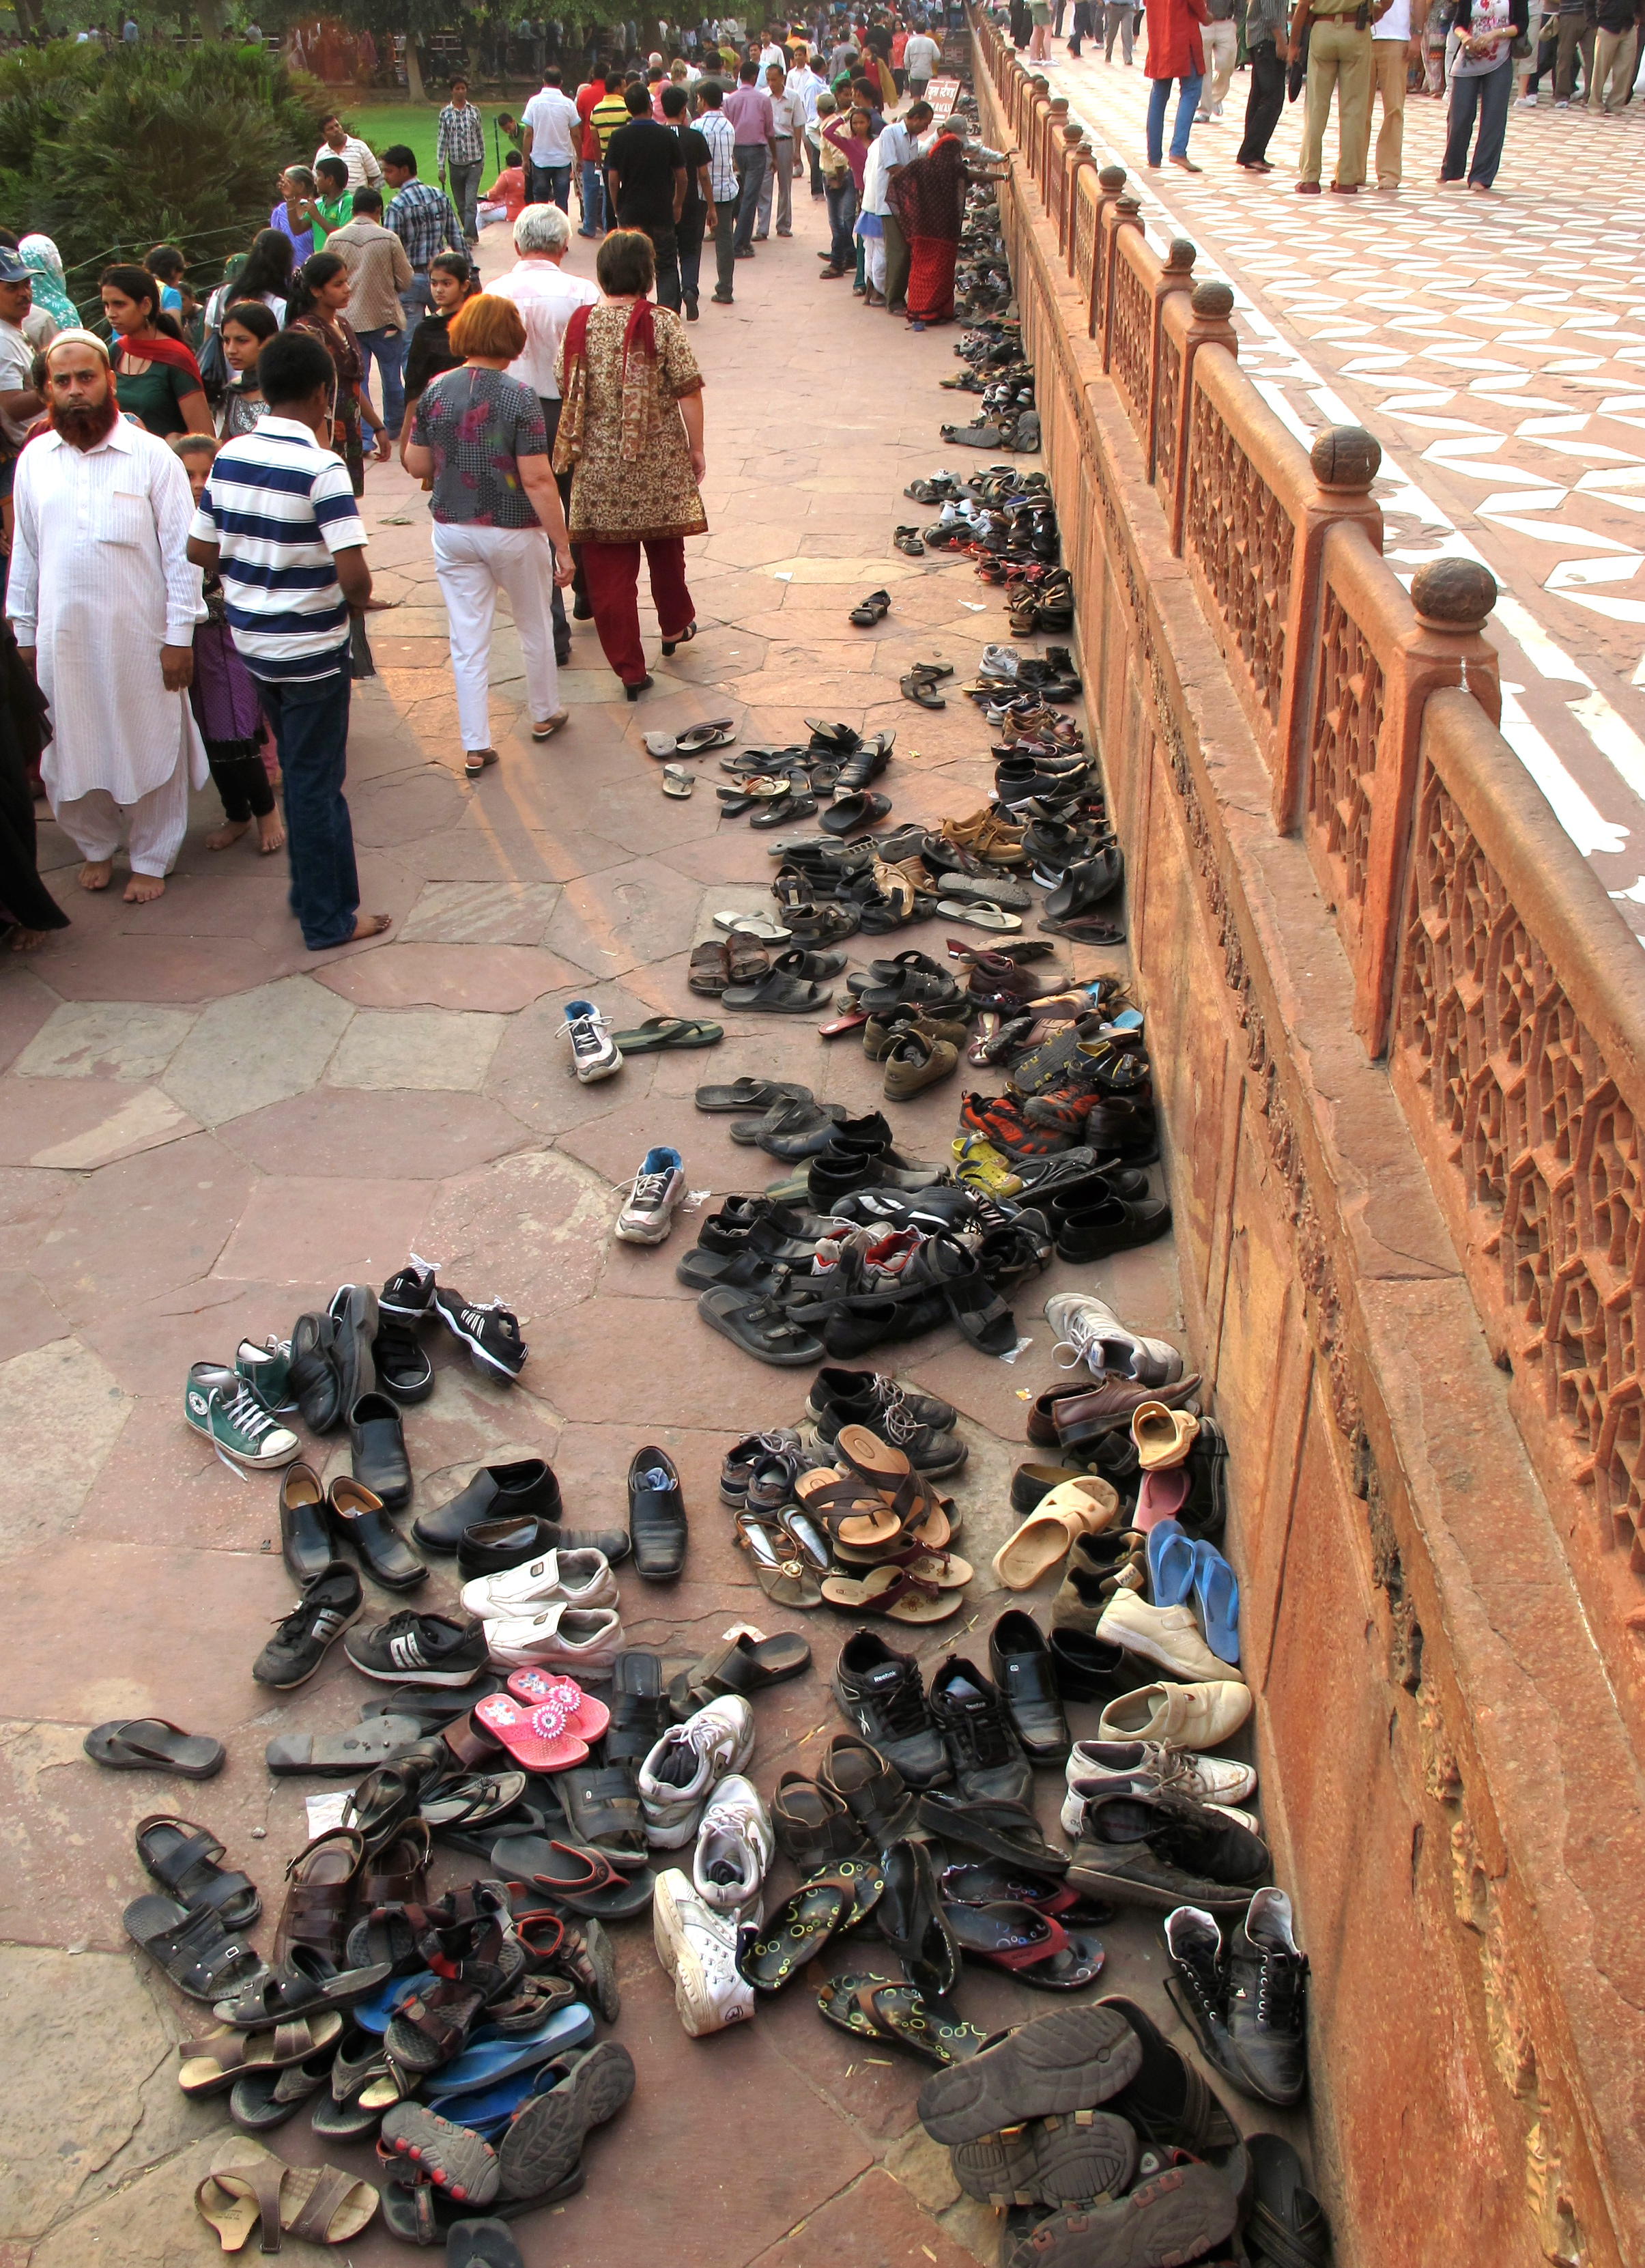 Shoes - Taj Mahal - Agra - India